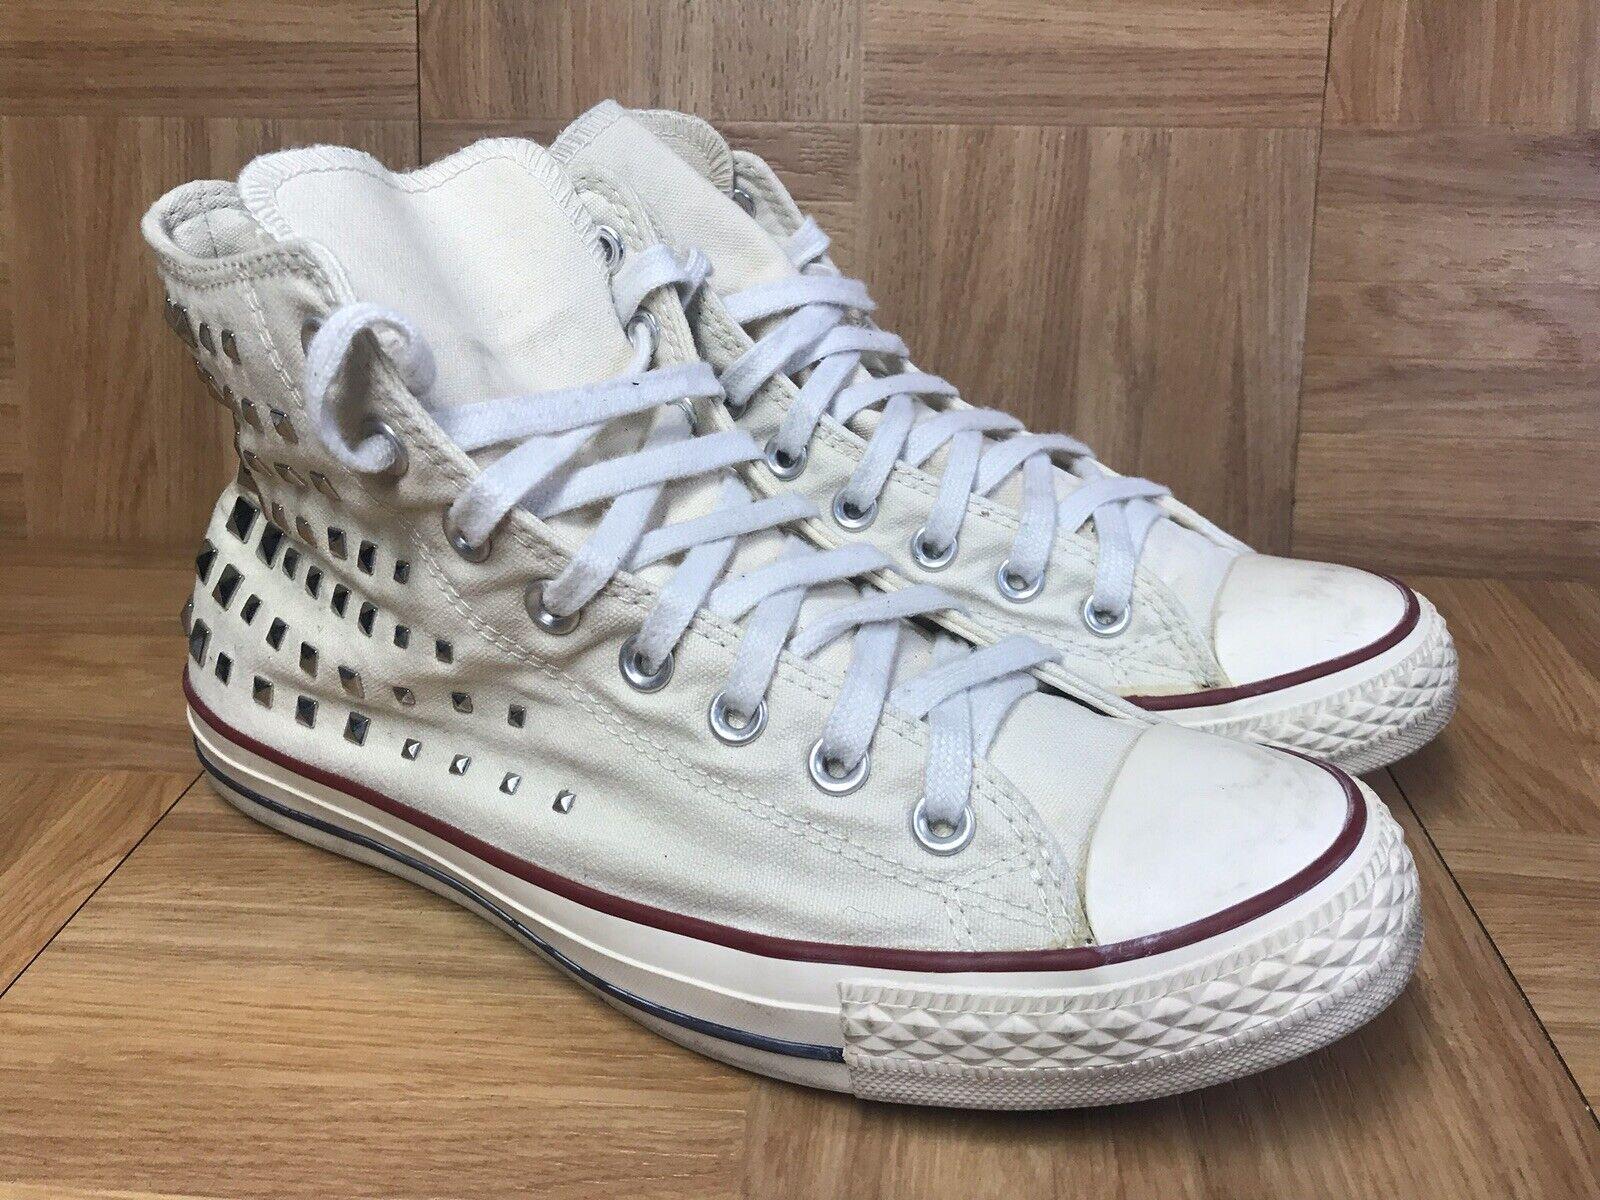 RARE Converse All Star Chuck Taylor STUDS White Silver Sneakers Sz 11 Women's